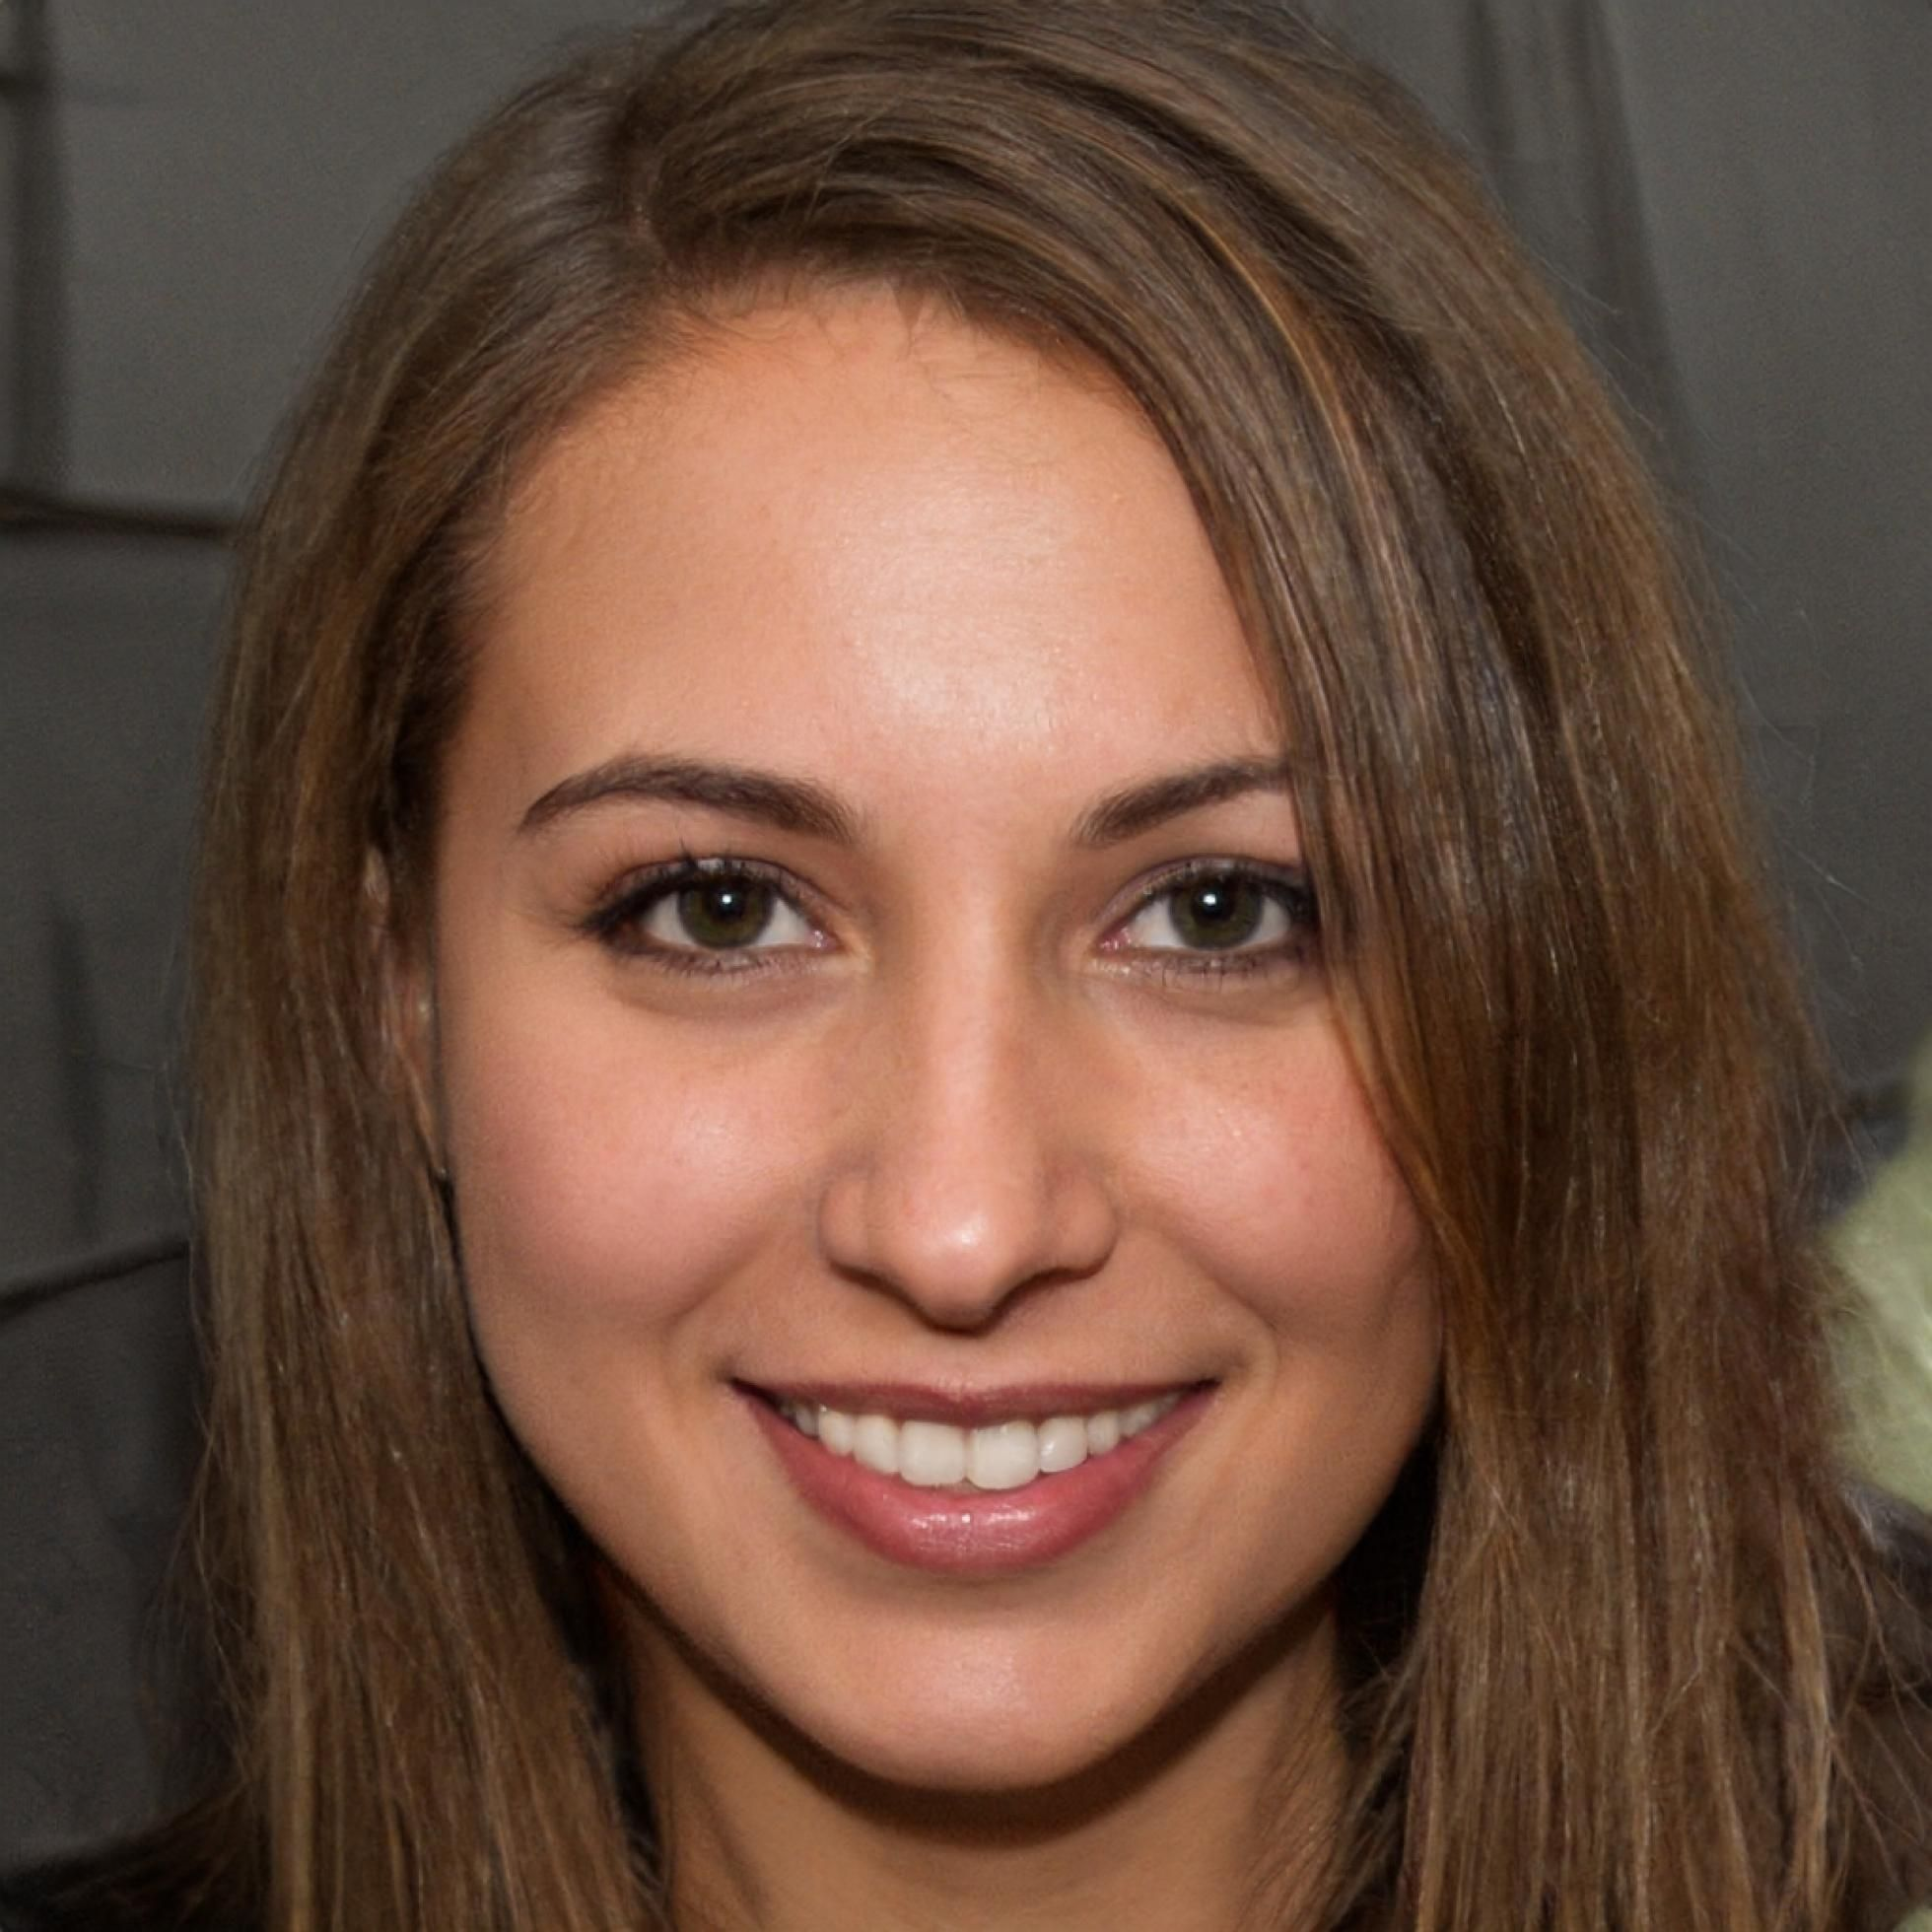 Марина Лефтеева, владелица студий маникюра